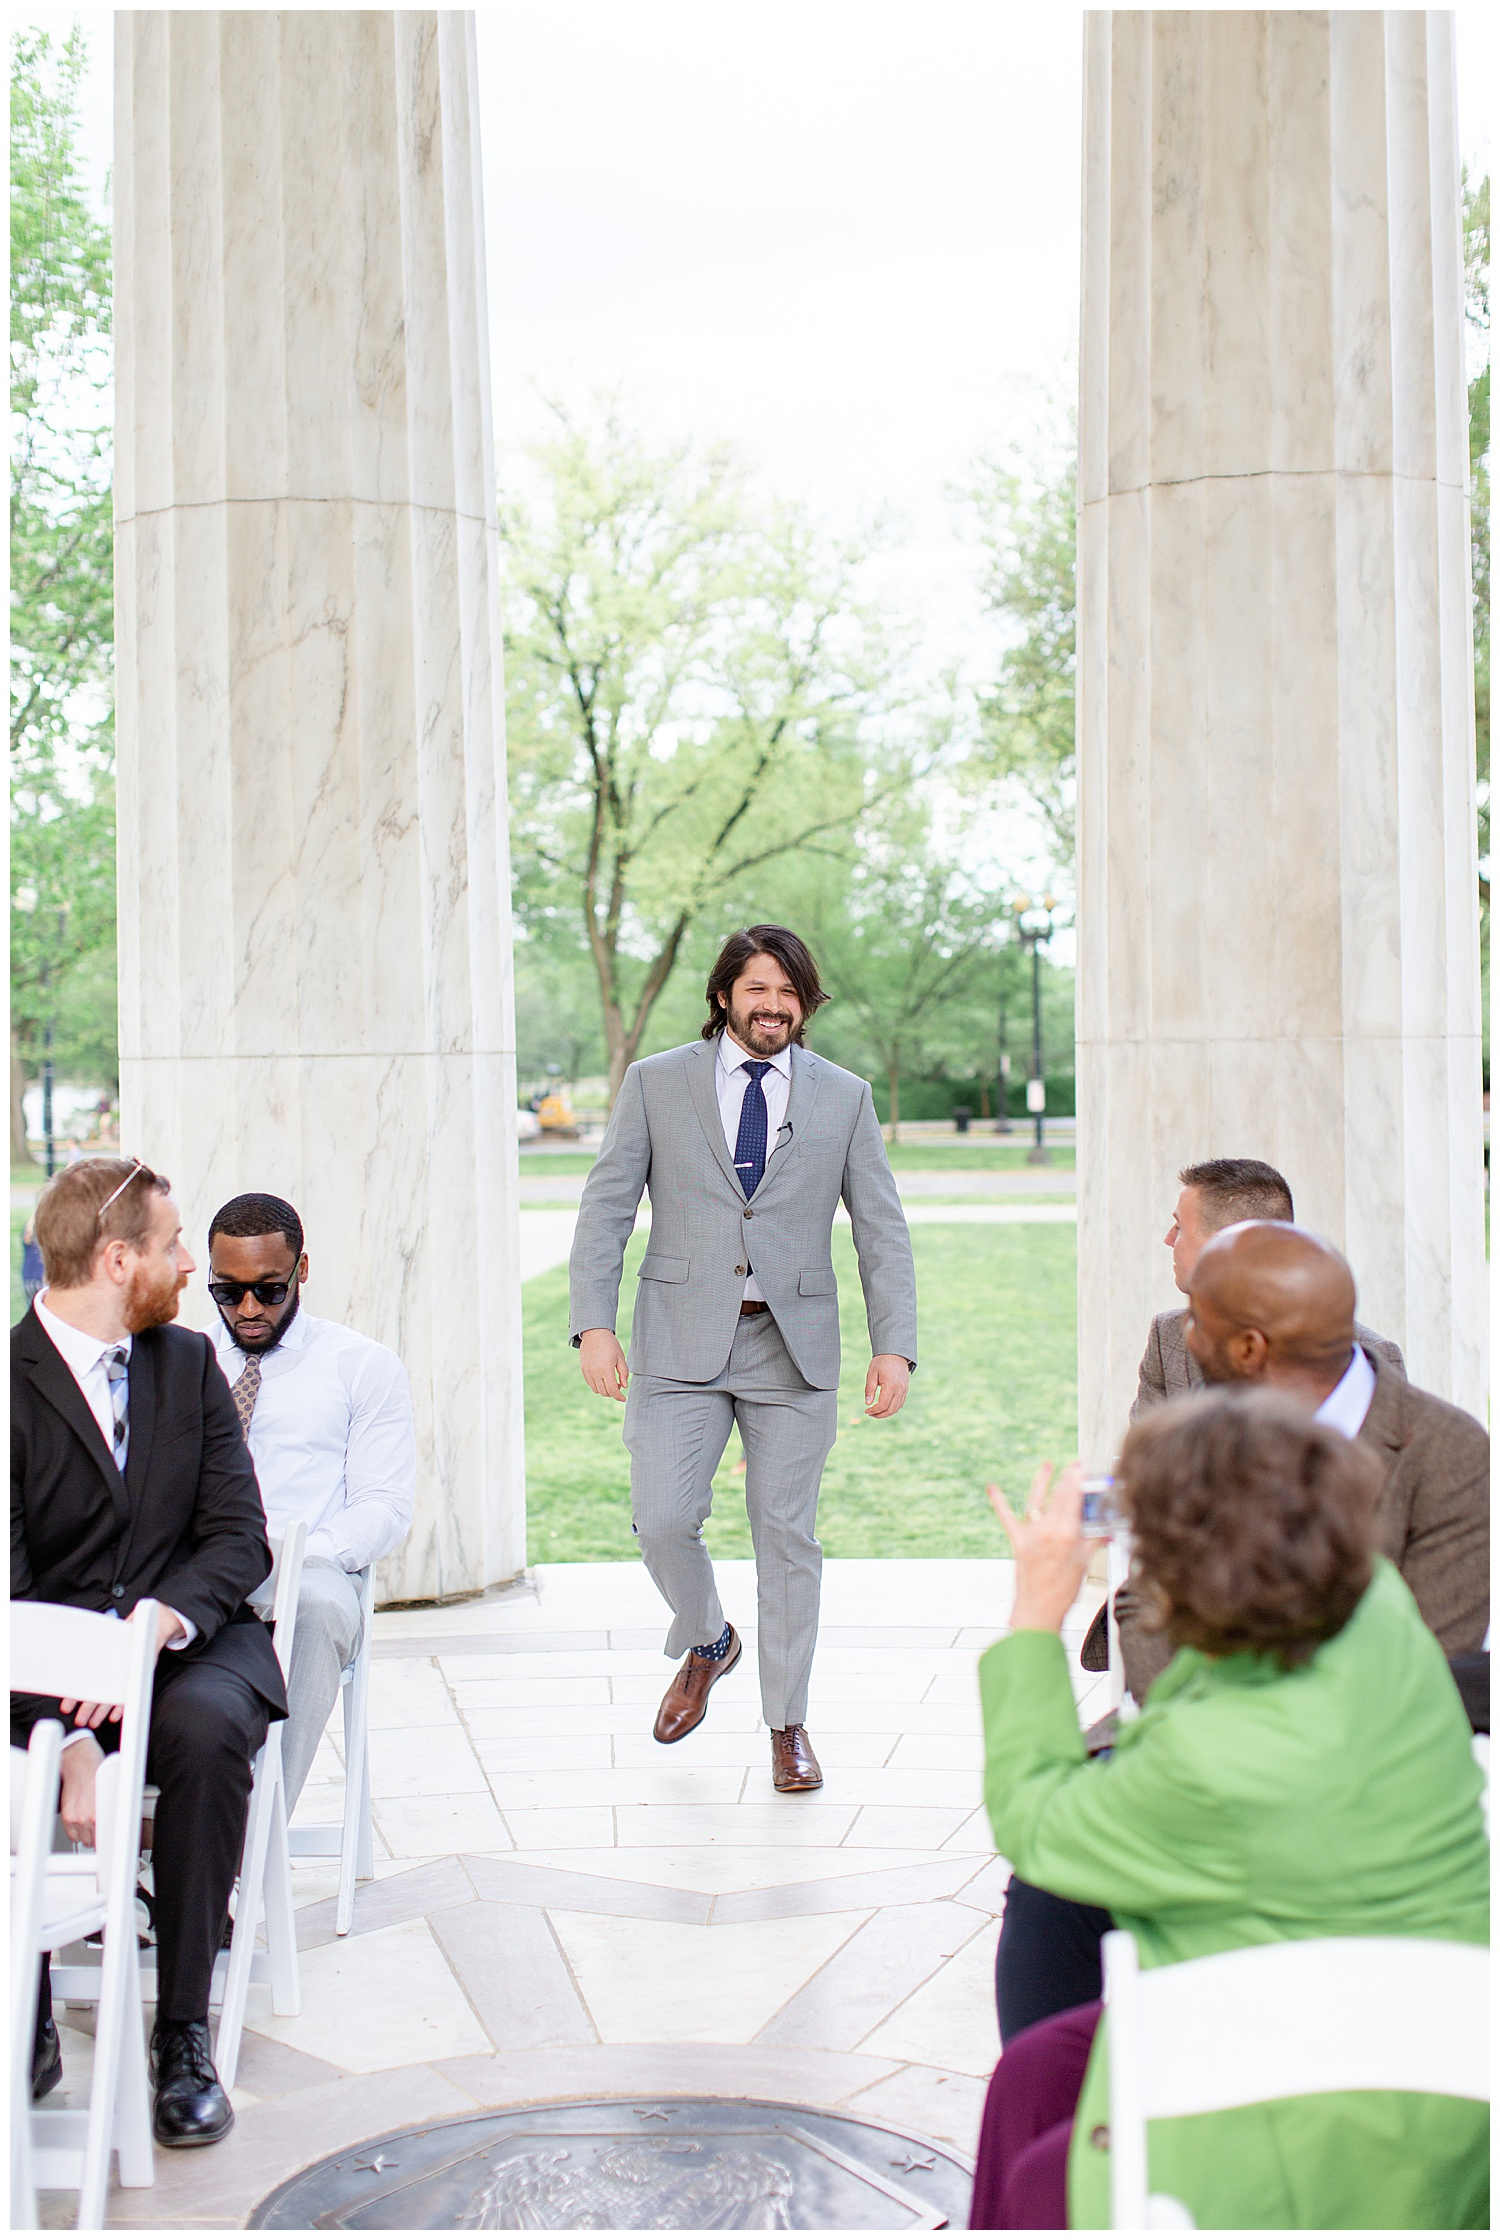 emily-belson-photography-washington-dc-wedding-05.jpg